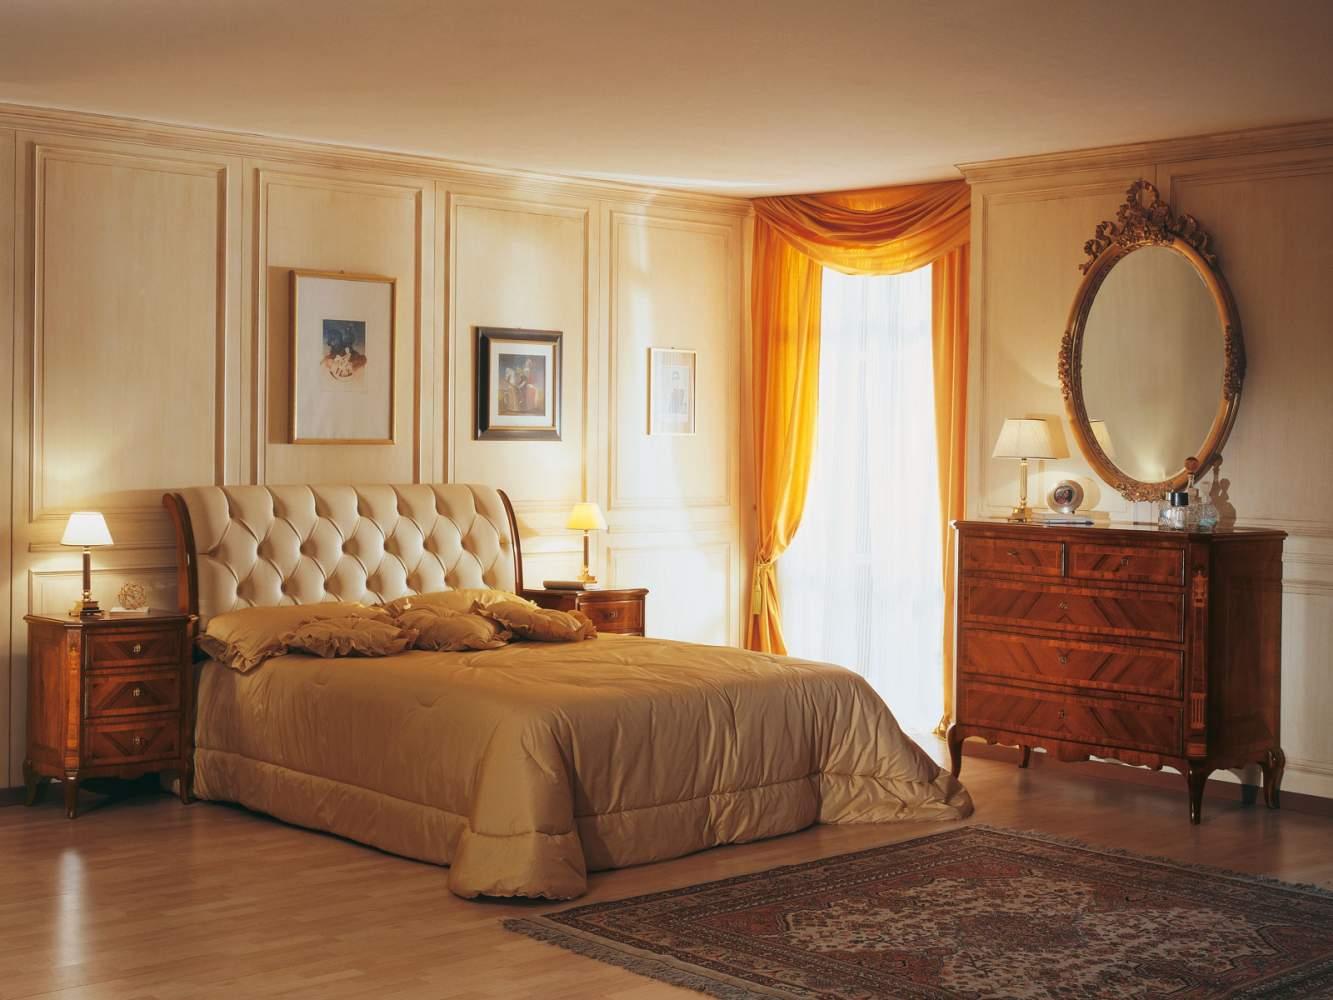 Camera da letto francese in stile 800 vimercati meda - Camere da letto stile inglese ...